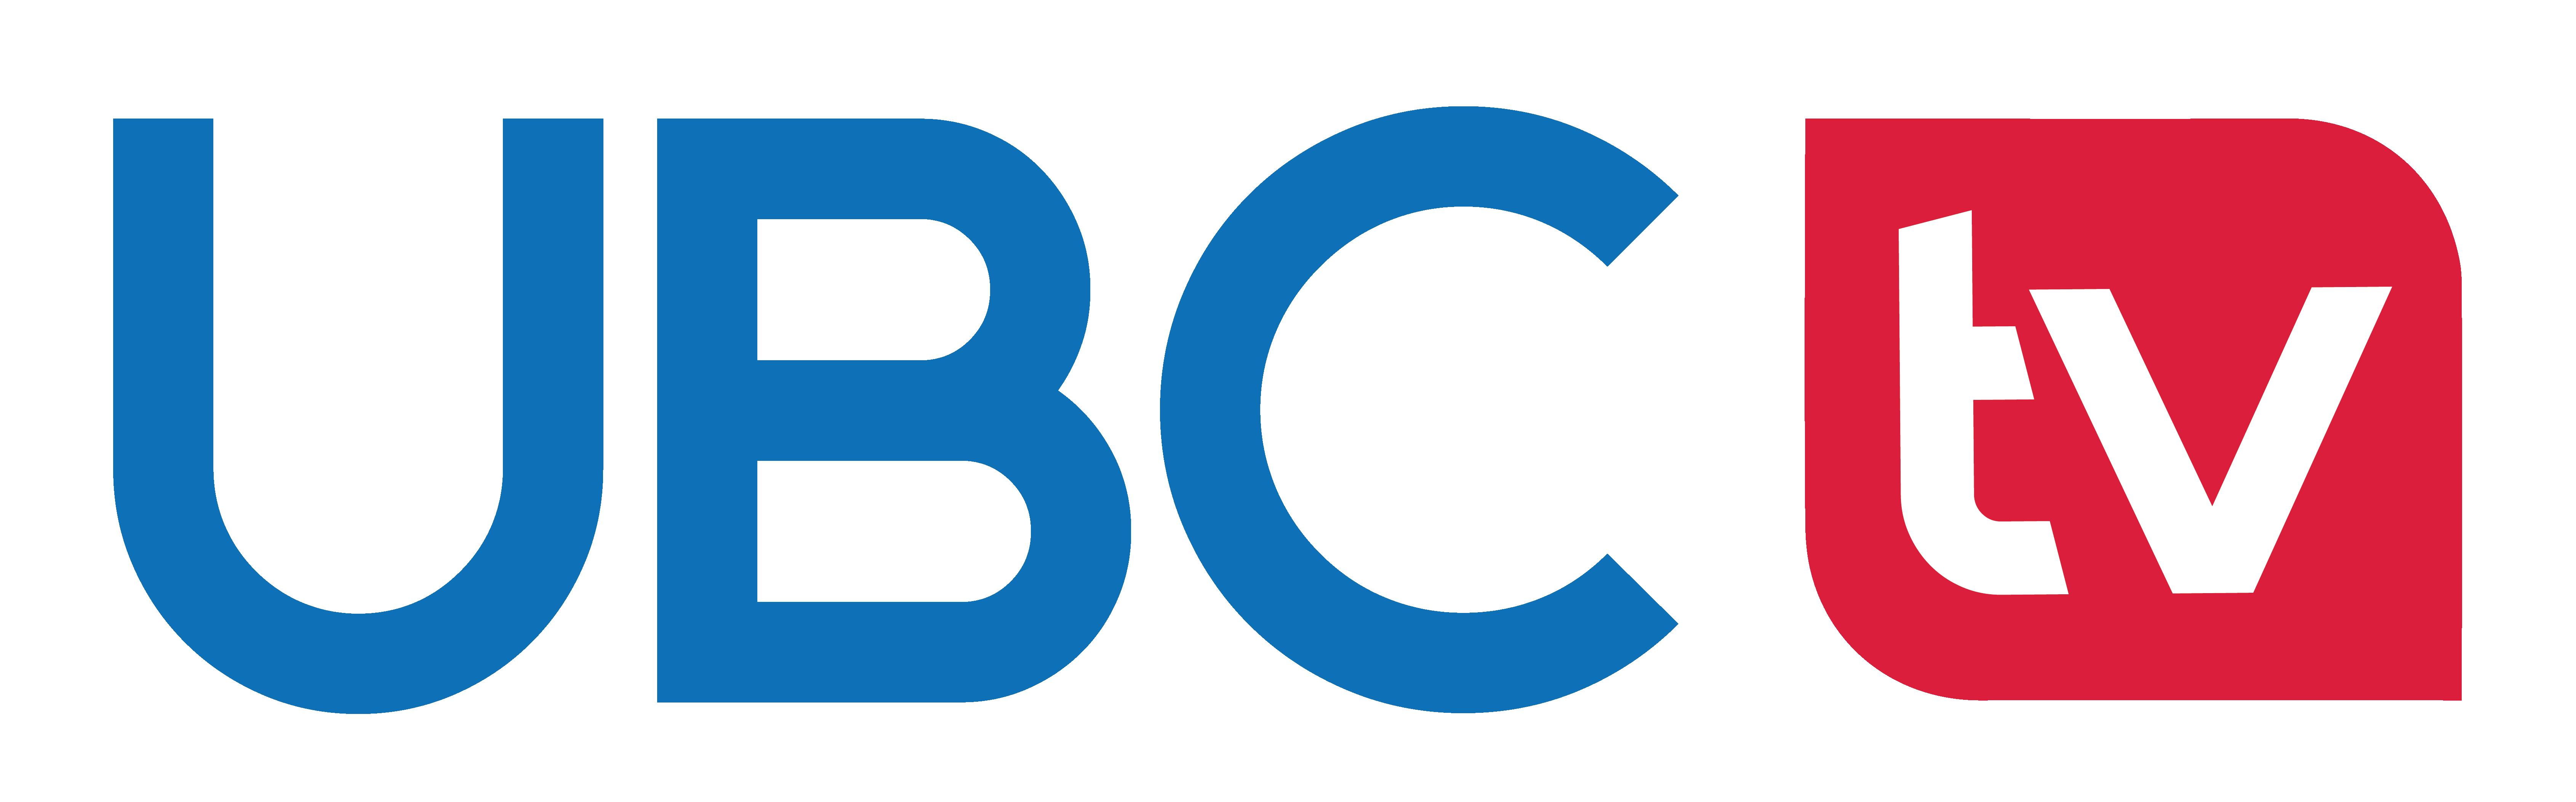 UBC VIỆT NAM